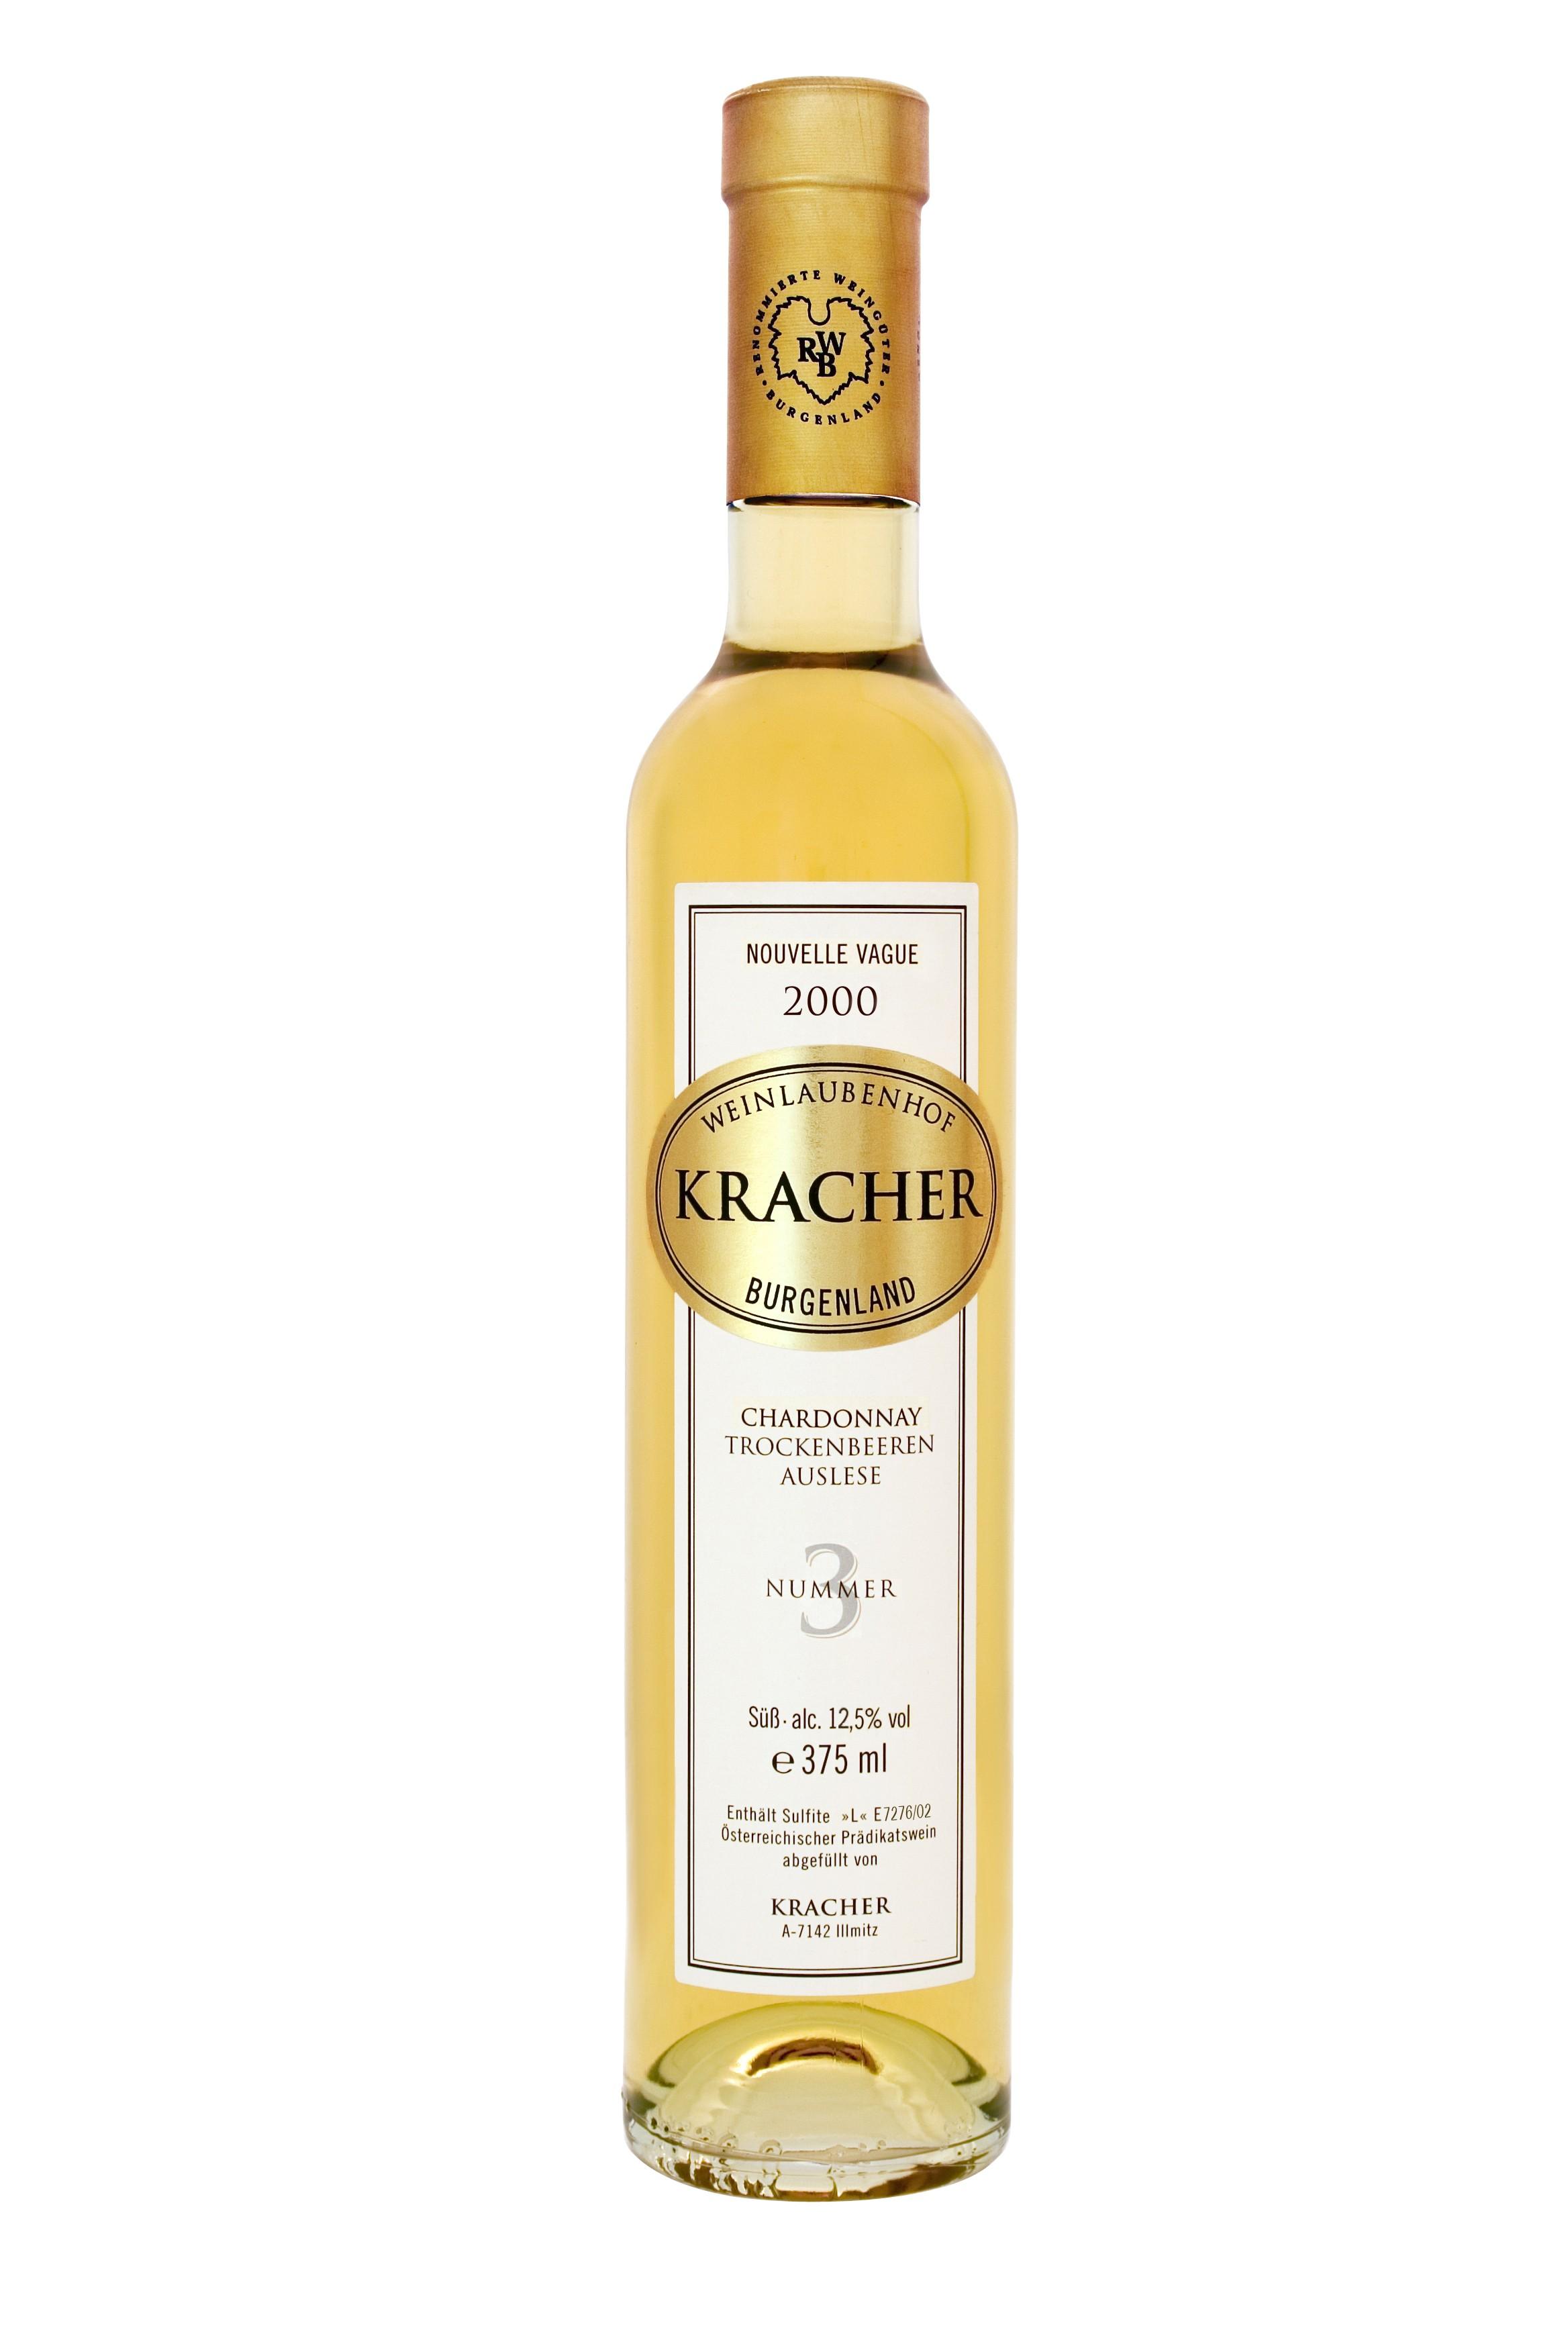 Kracher - Rarität Chardonnay Nr. 3 Trockenbeerenauslese, 2000